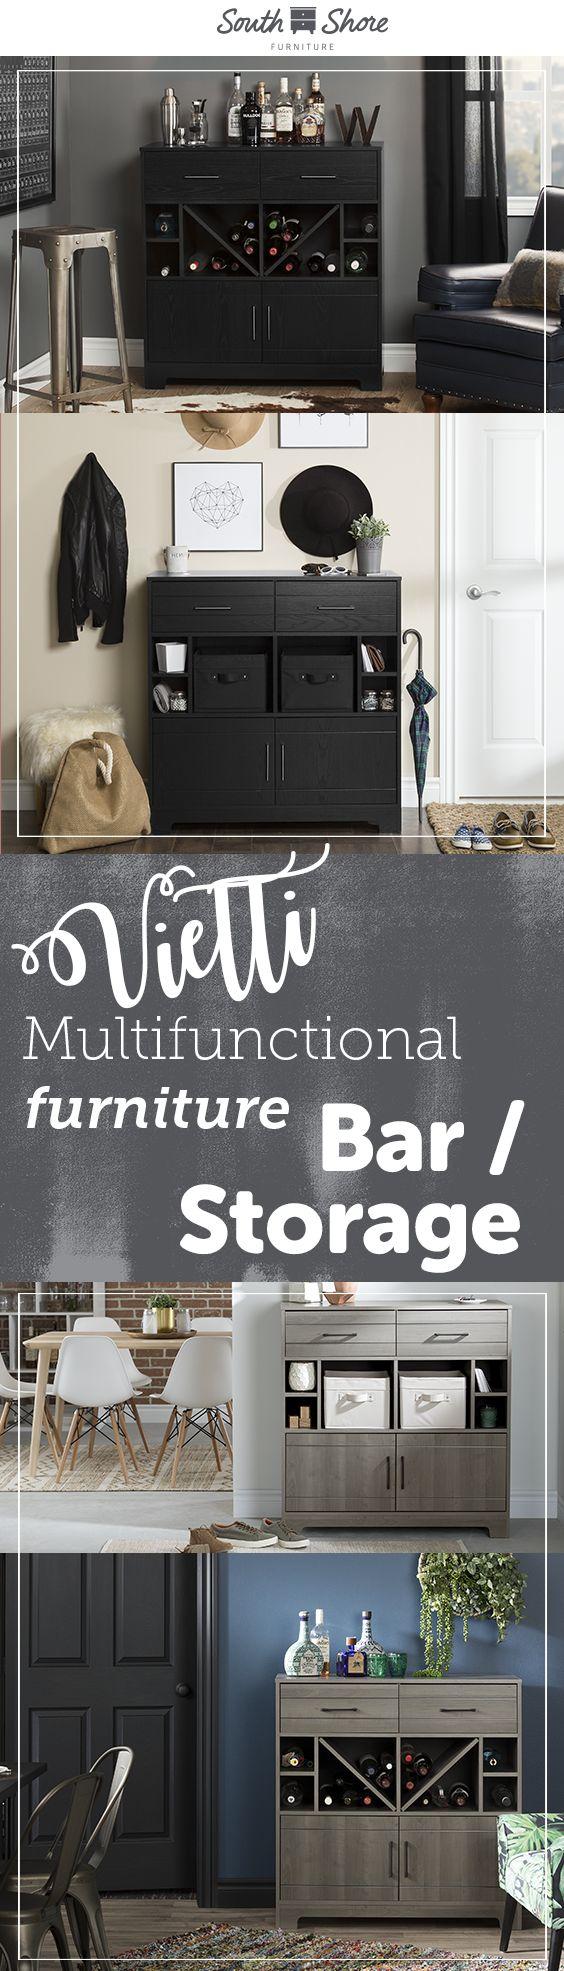 82 best Bar cabinets and cellars images on Pinterest | Barschränke ...